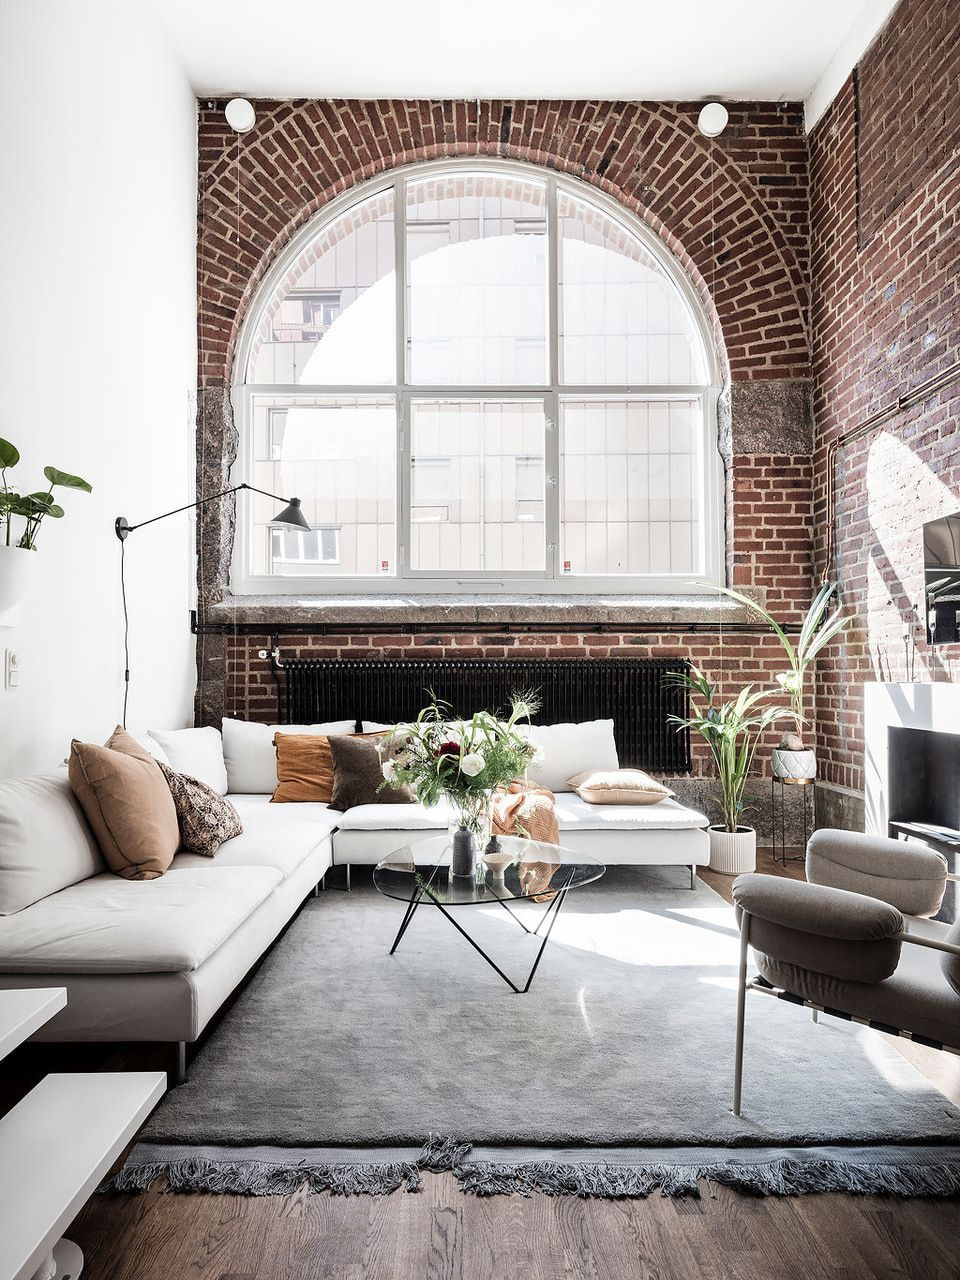 Living Room Interior Design Exposed Brick Wall Big Grid Window White Sofa Modern Simple Ne Living Decor Living Design Interior Design Living Room